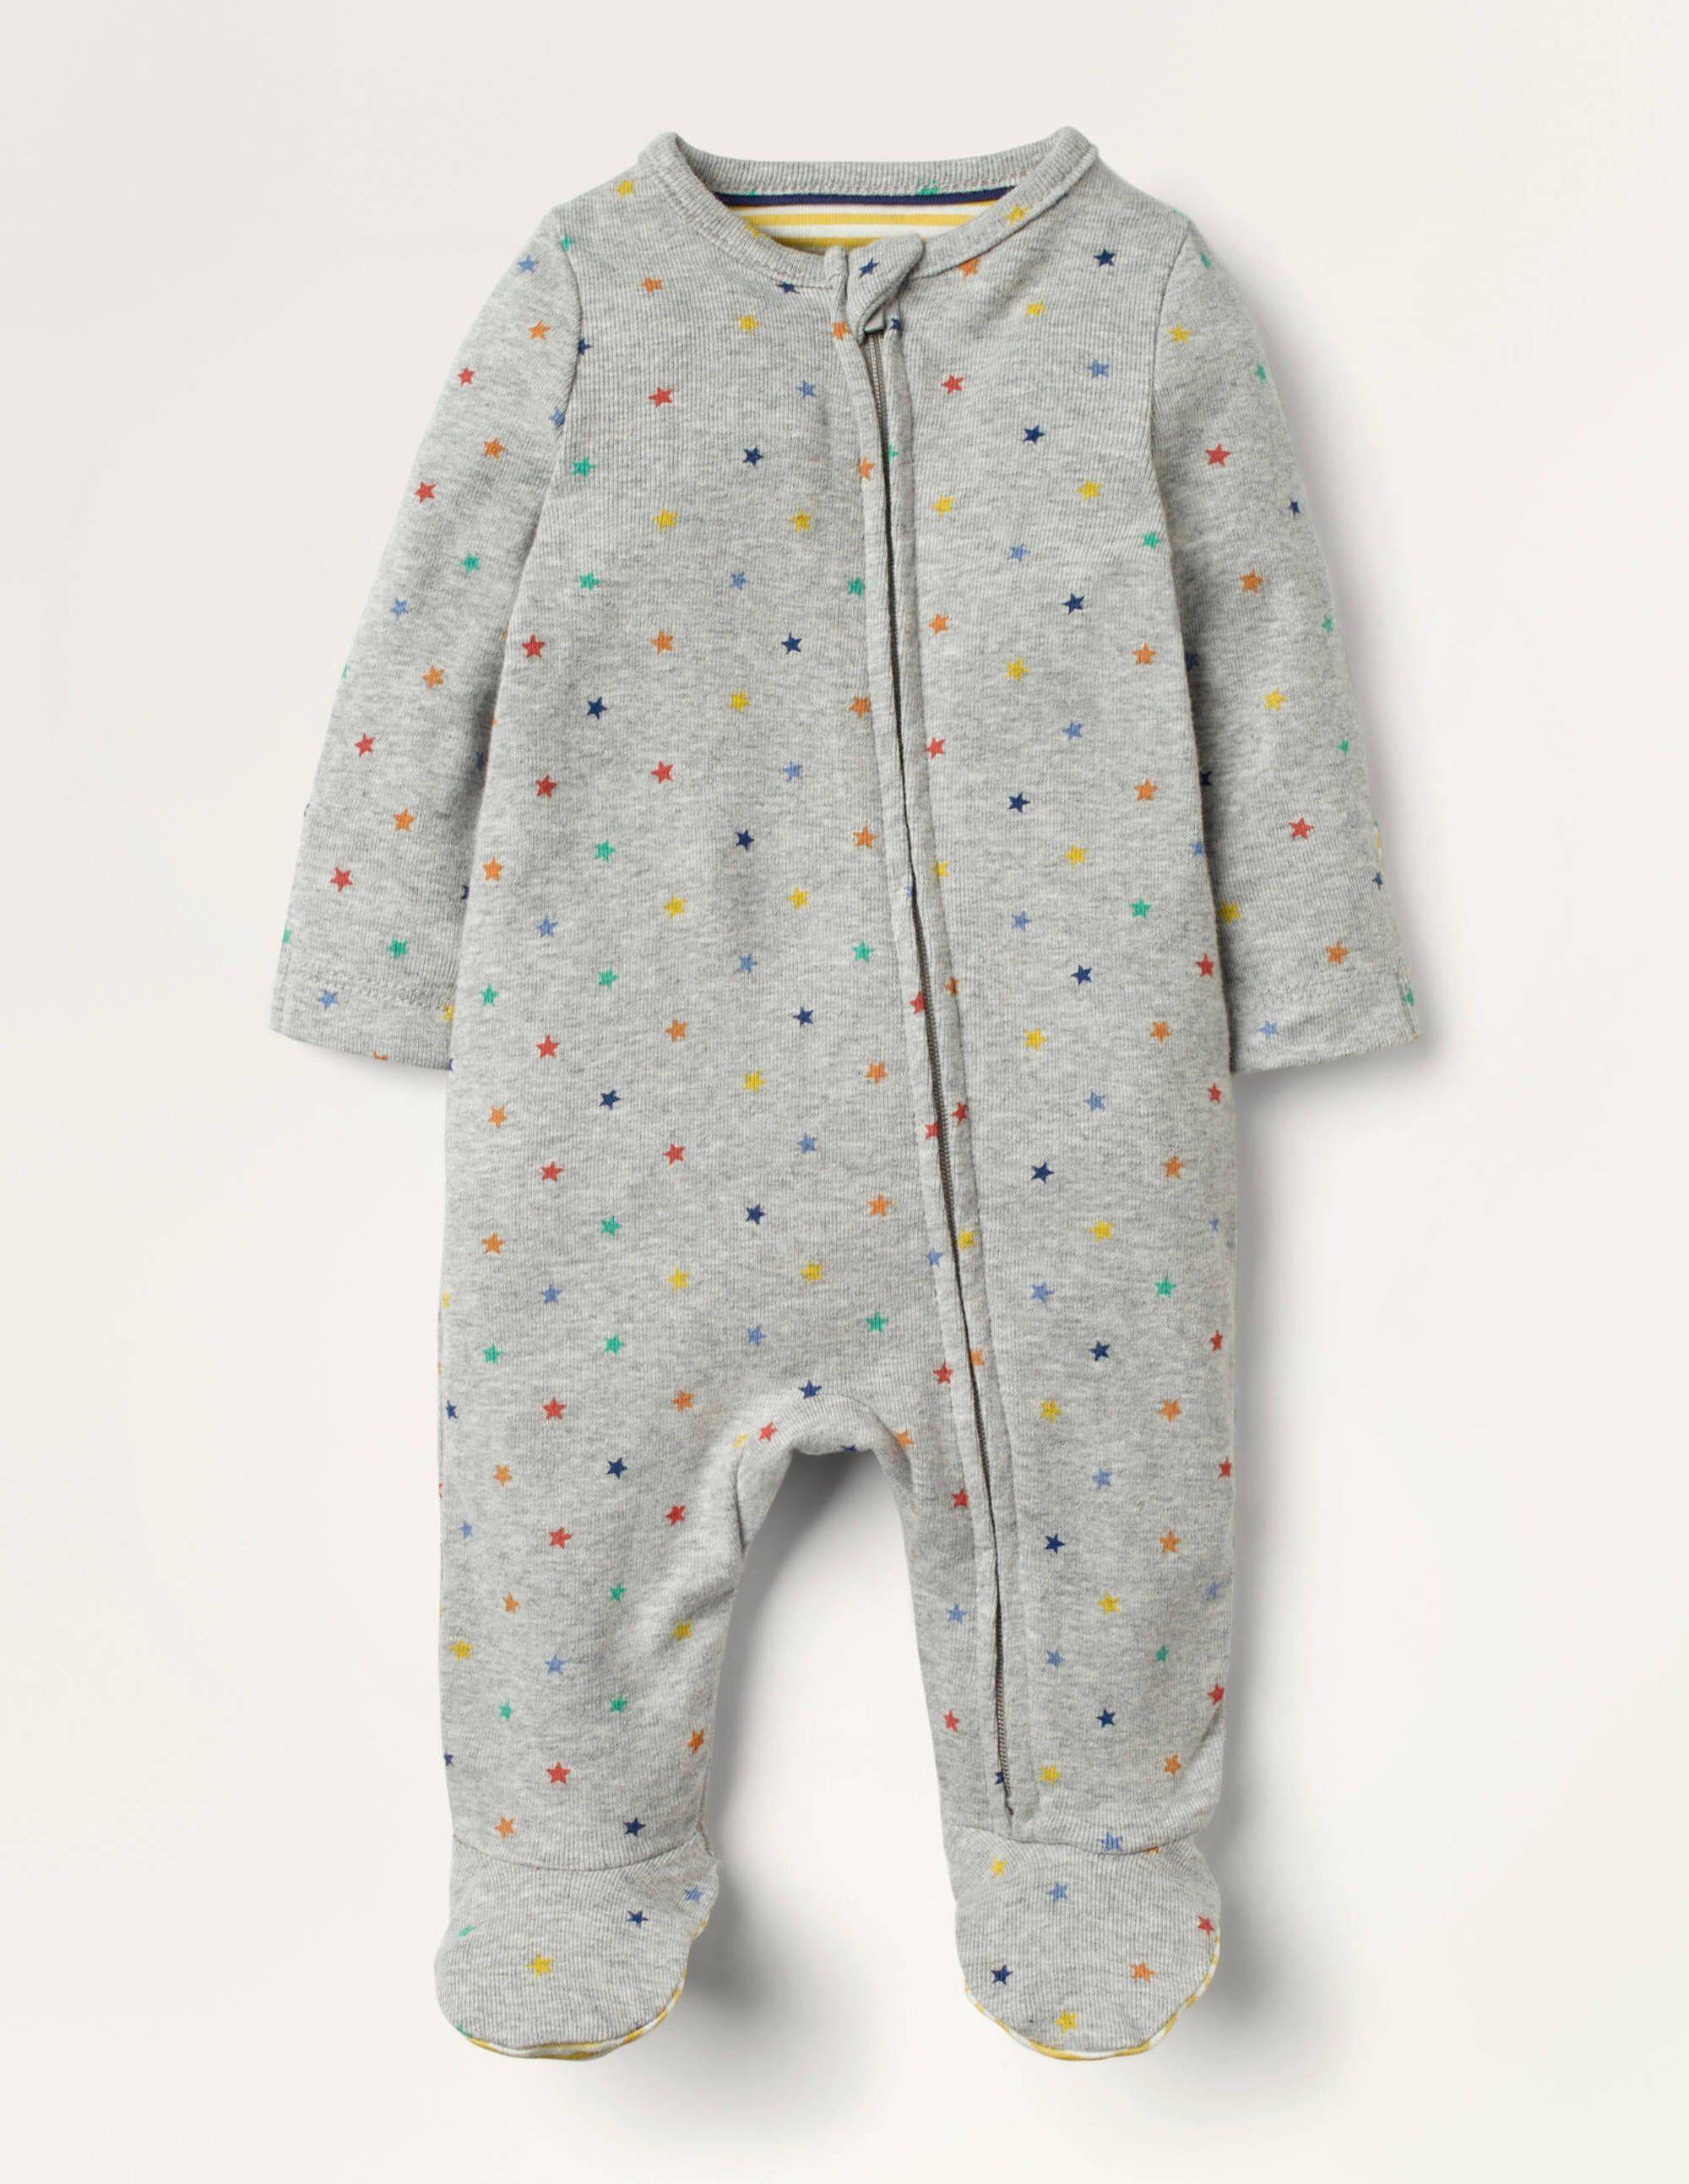 Baby Grenouillère zippée ultra-douce à motif étoile GRY Bébé Boden, Grey - 18-24m